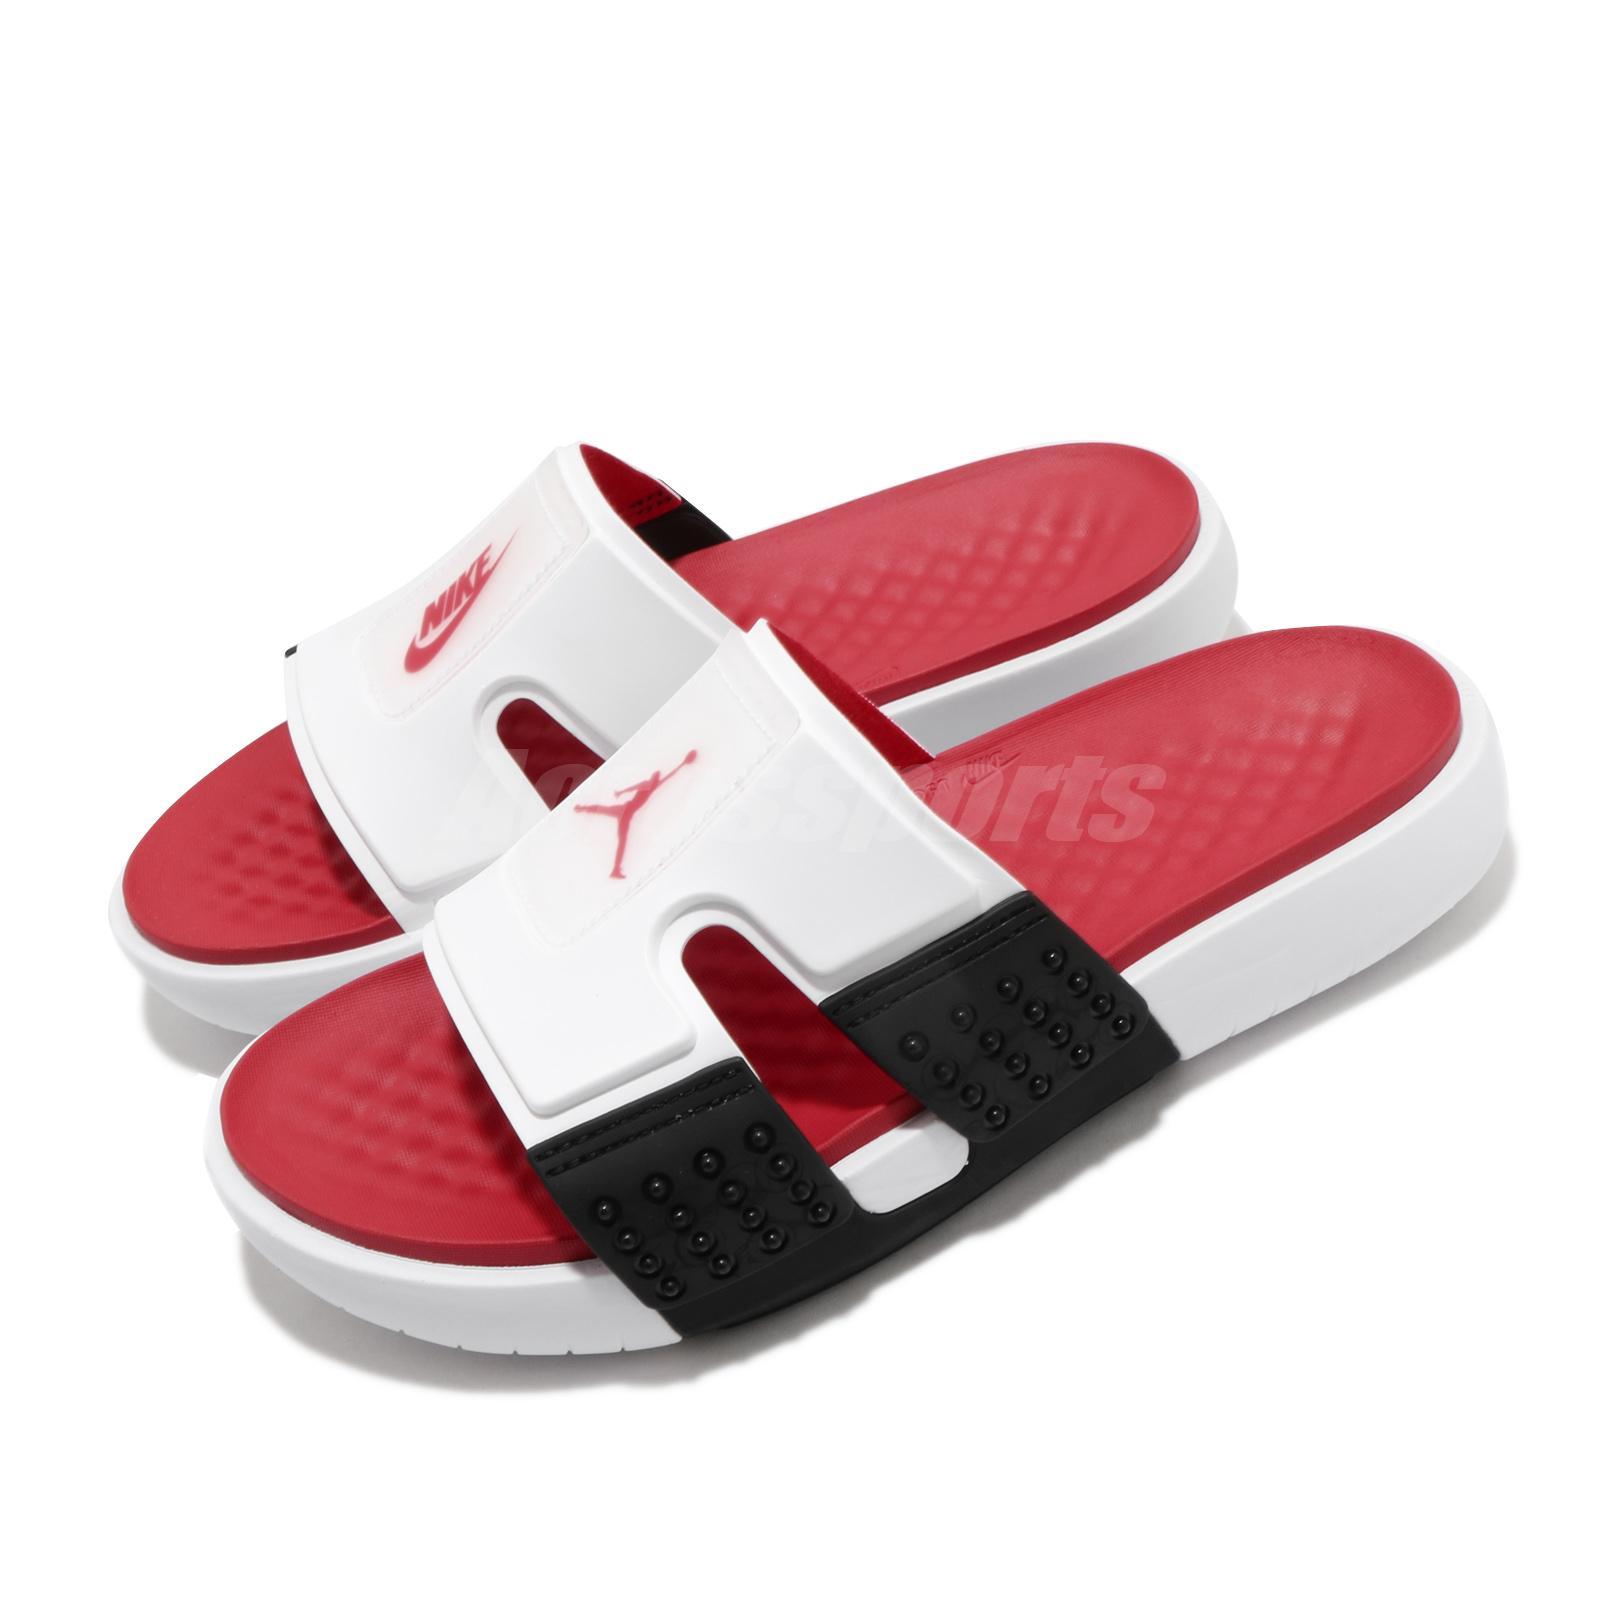 Nike Jordan Hydro 8 Retro White Black